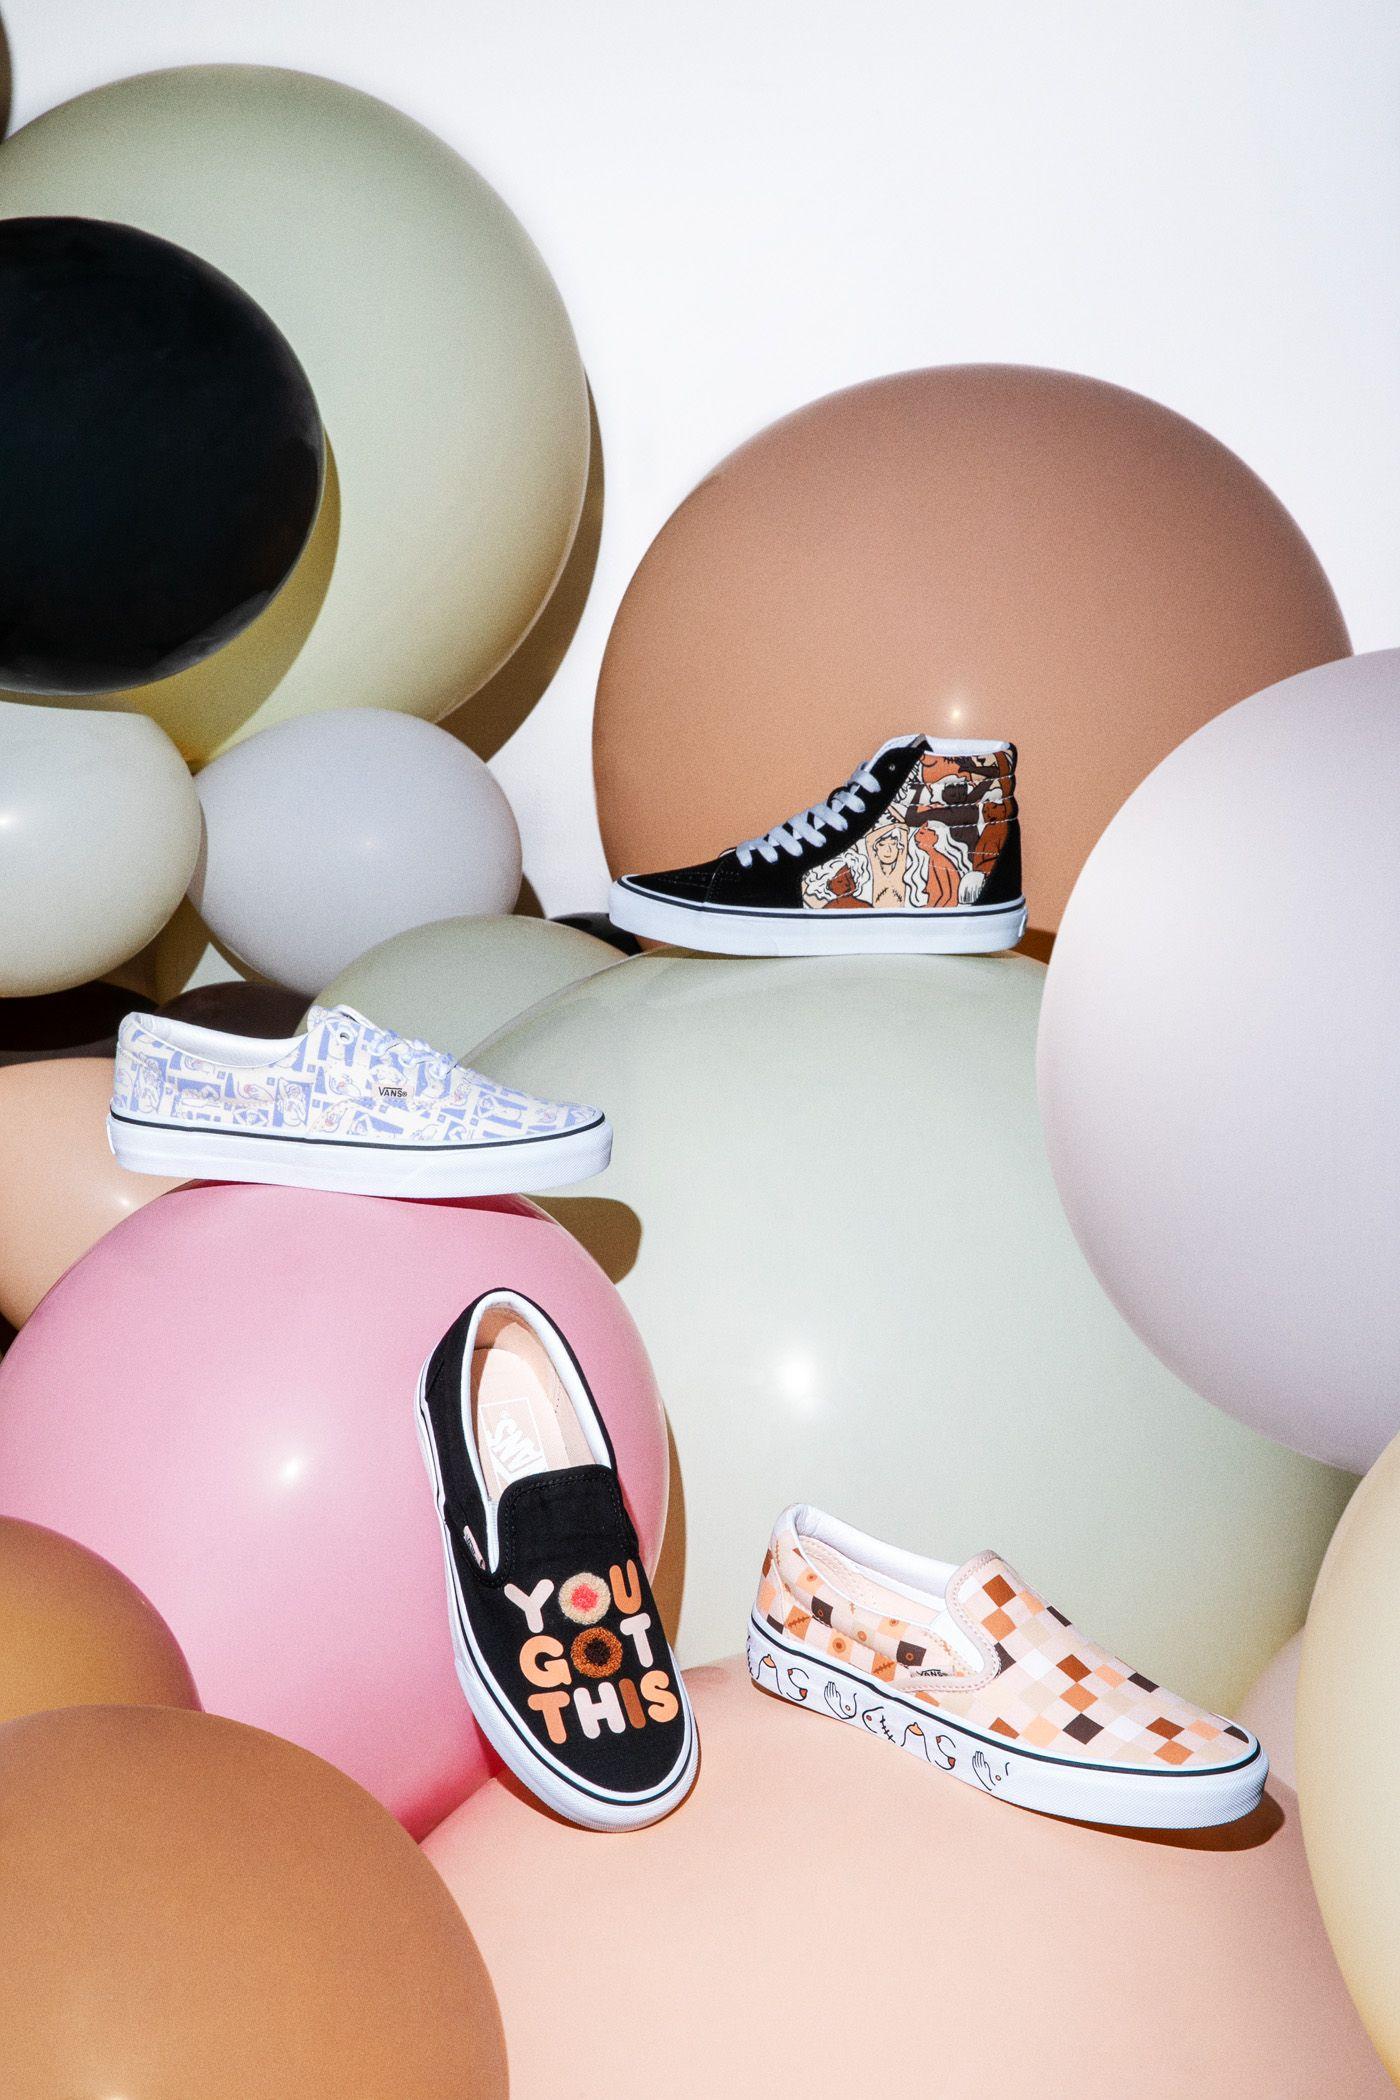 https://images.vans.com/is/image/VansBrand/HO19_BreastCancerAwareness_FootwearCollection_1028?wid=1400